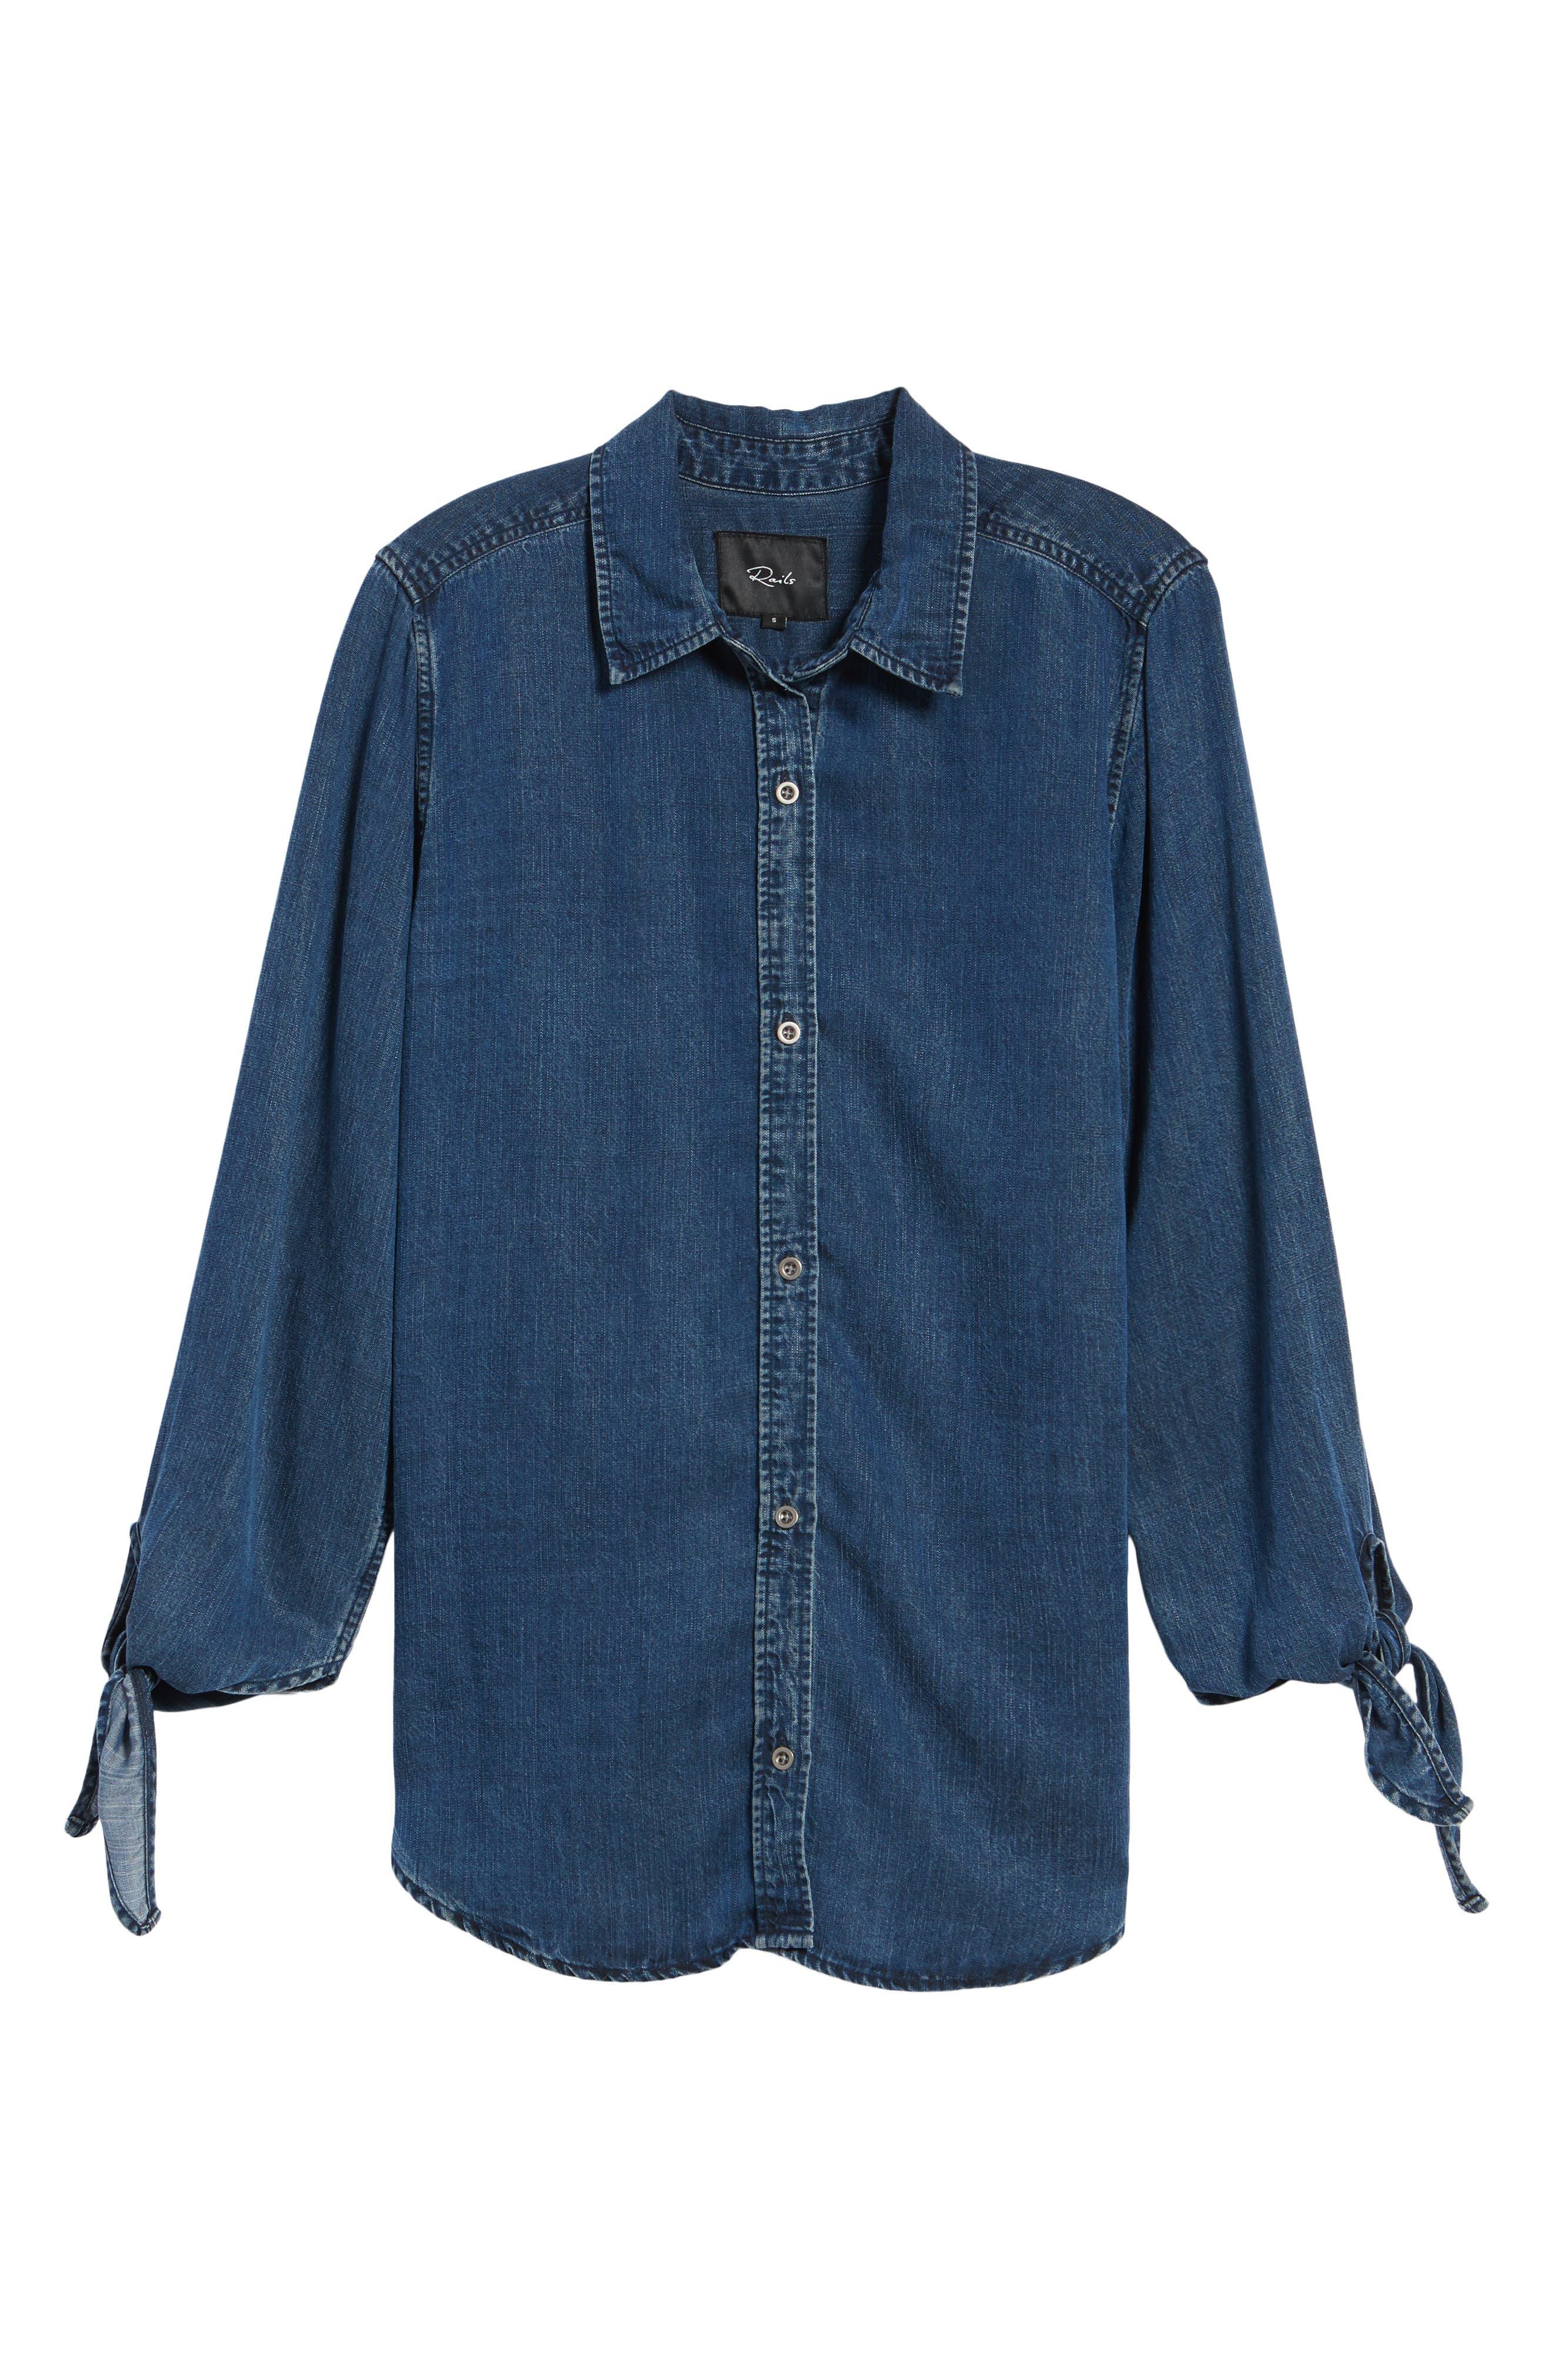 Bethany Tie Cuff Denim Shirt,                             Alternate thumbnail 6, color,                             Dark Vintage Wash